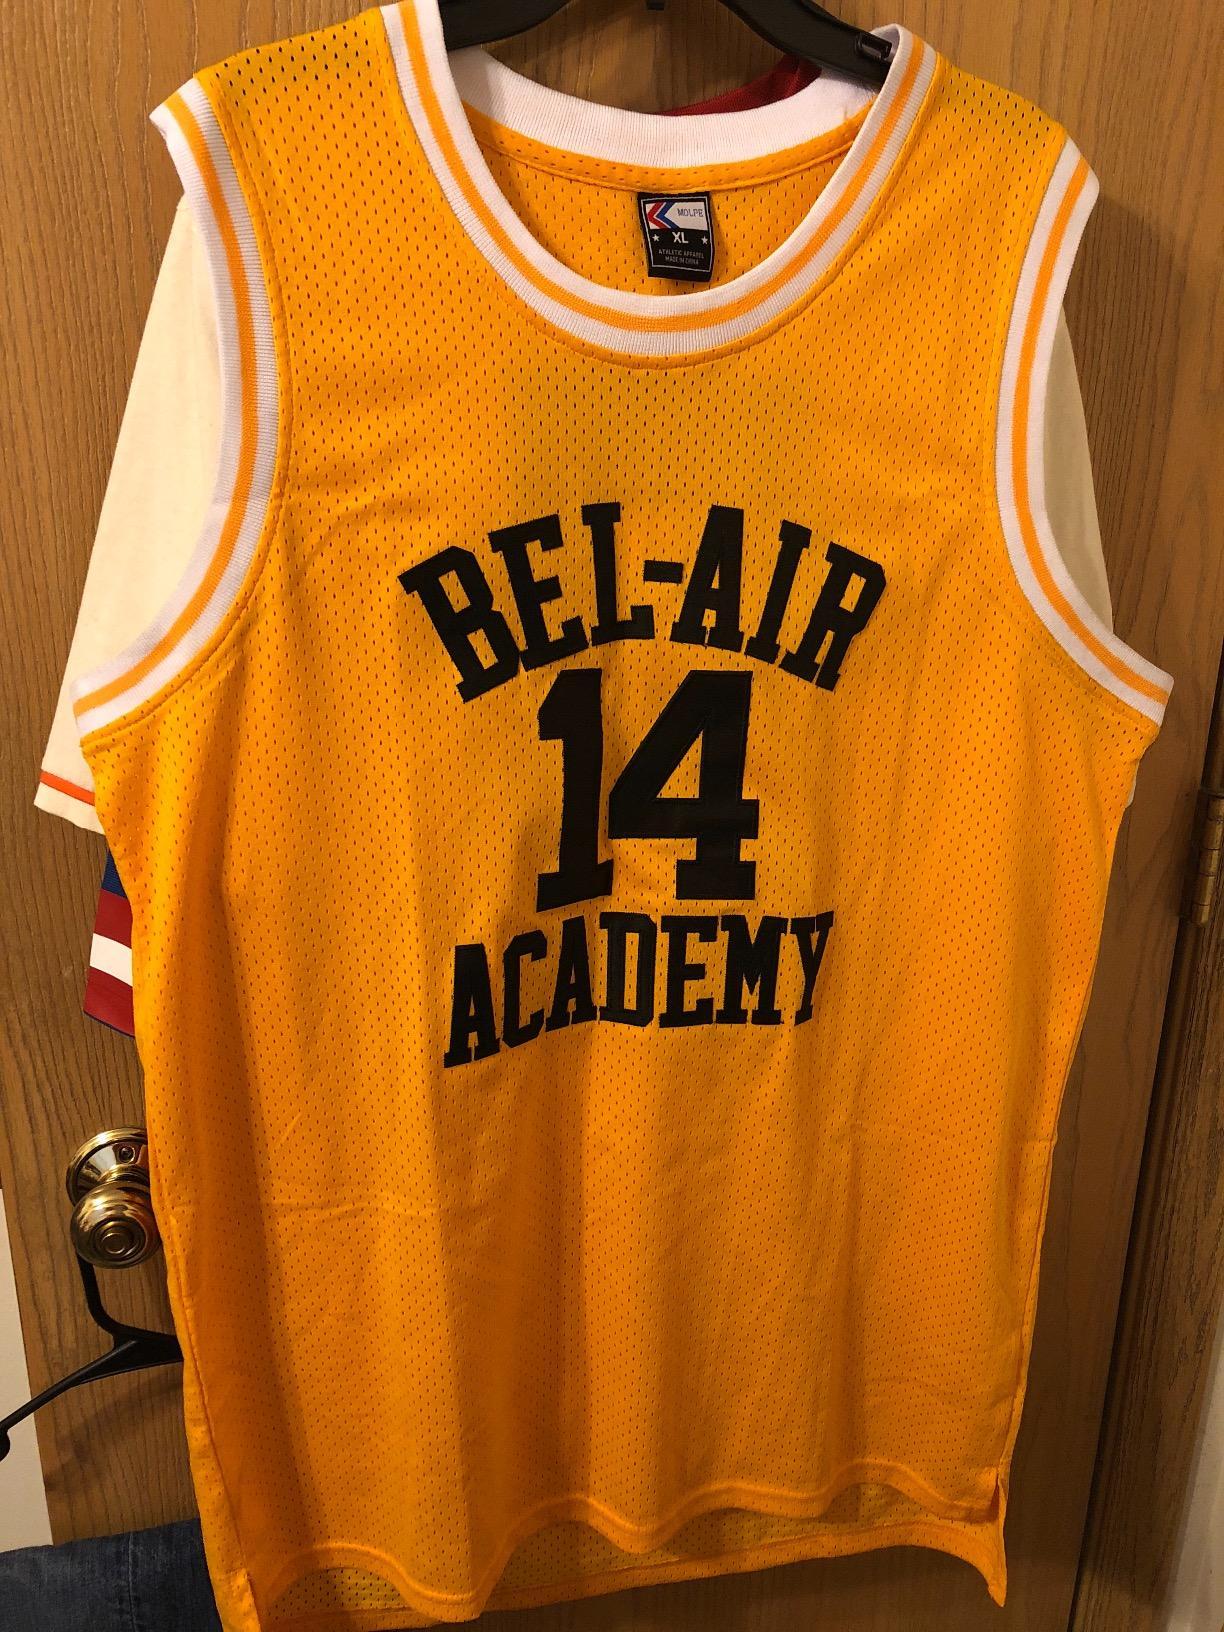 caf2efb0de17 Will Smith  14 - Fresh Prince Of Bel-Air Basketball Jerseys ...